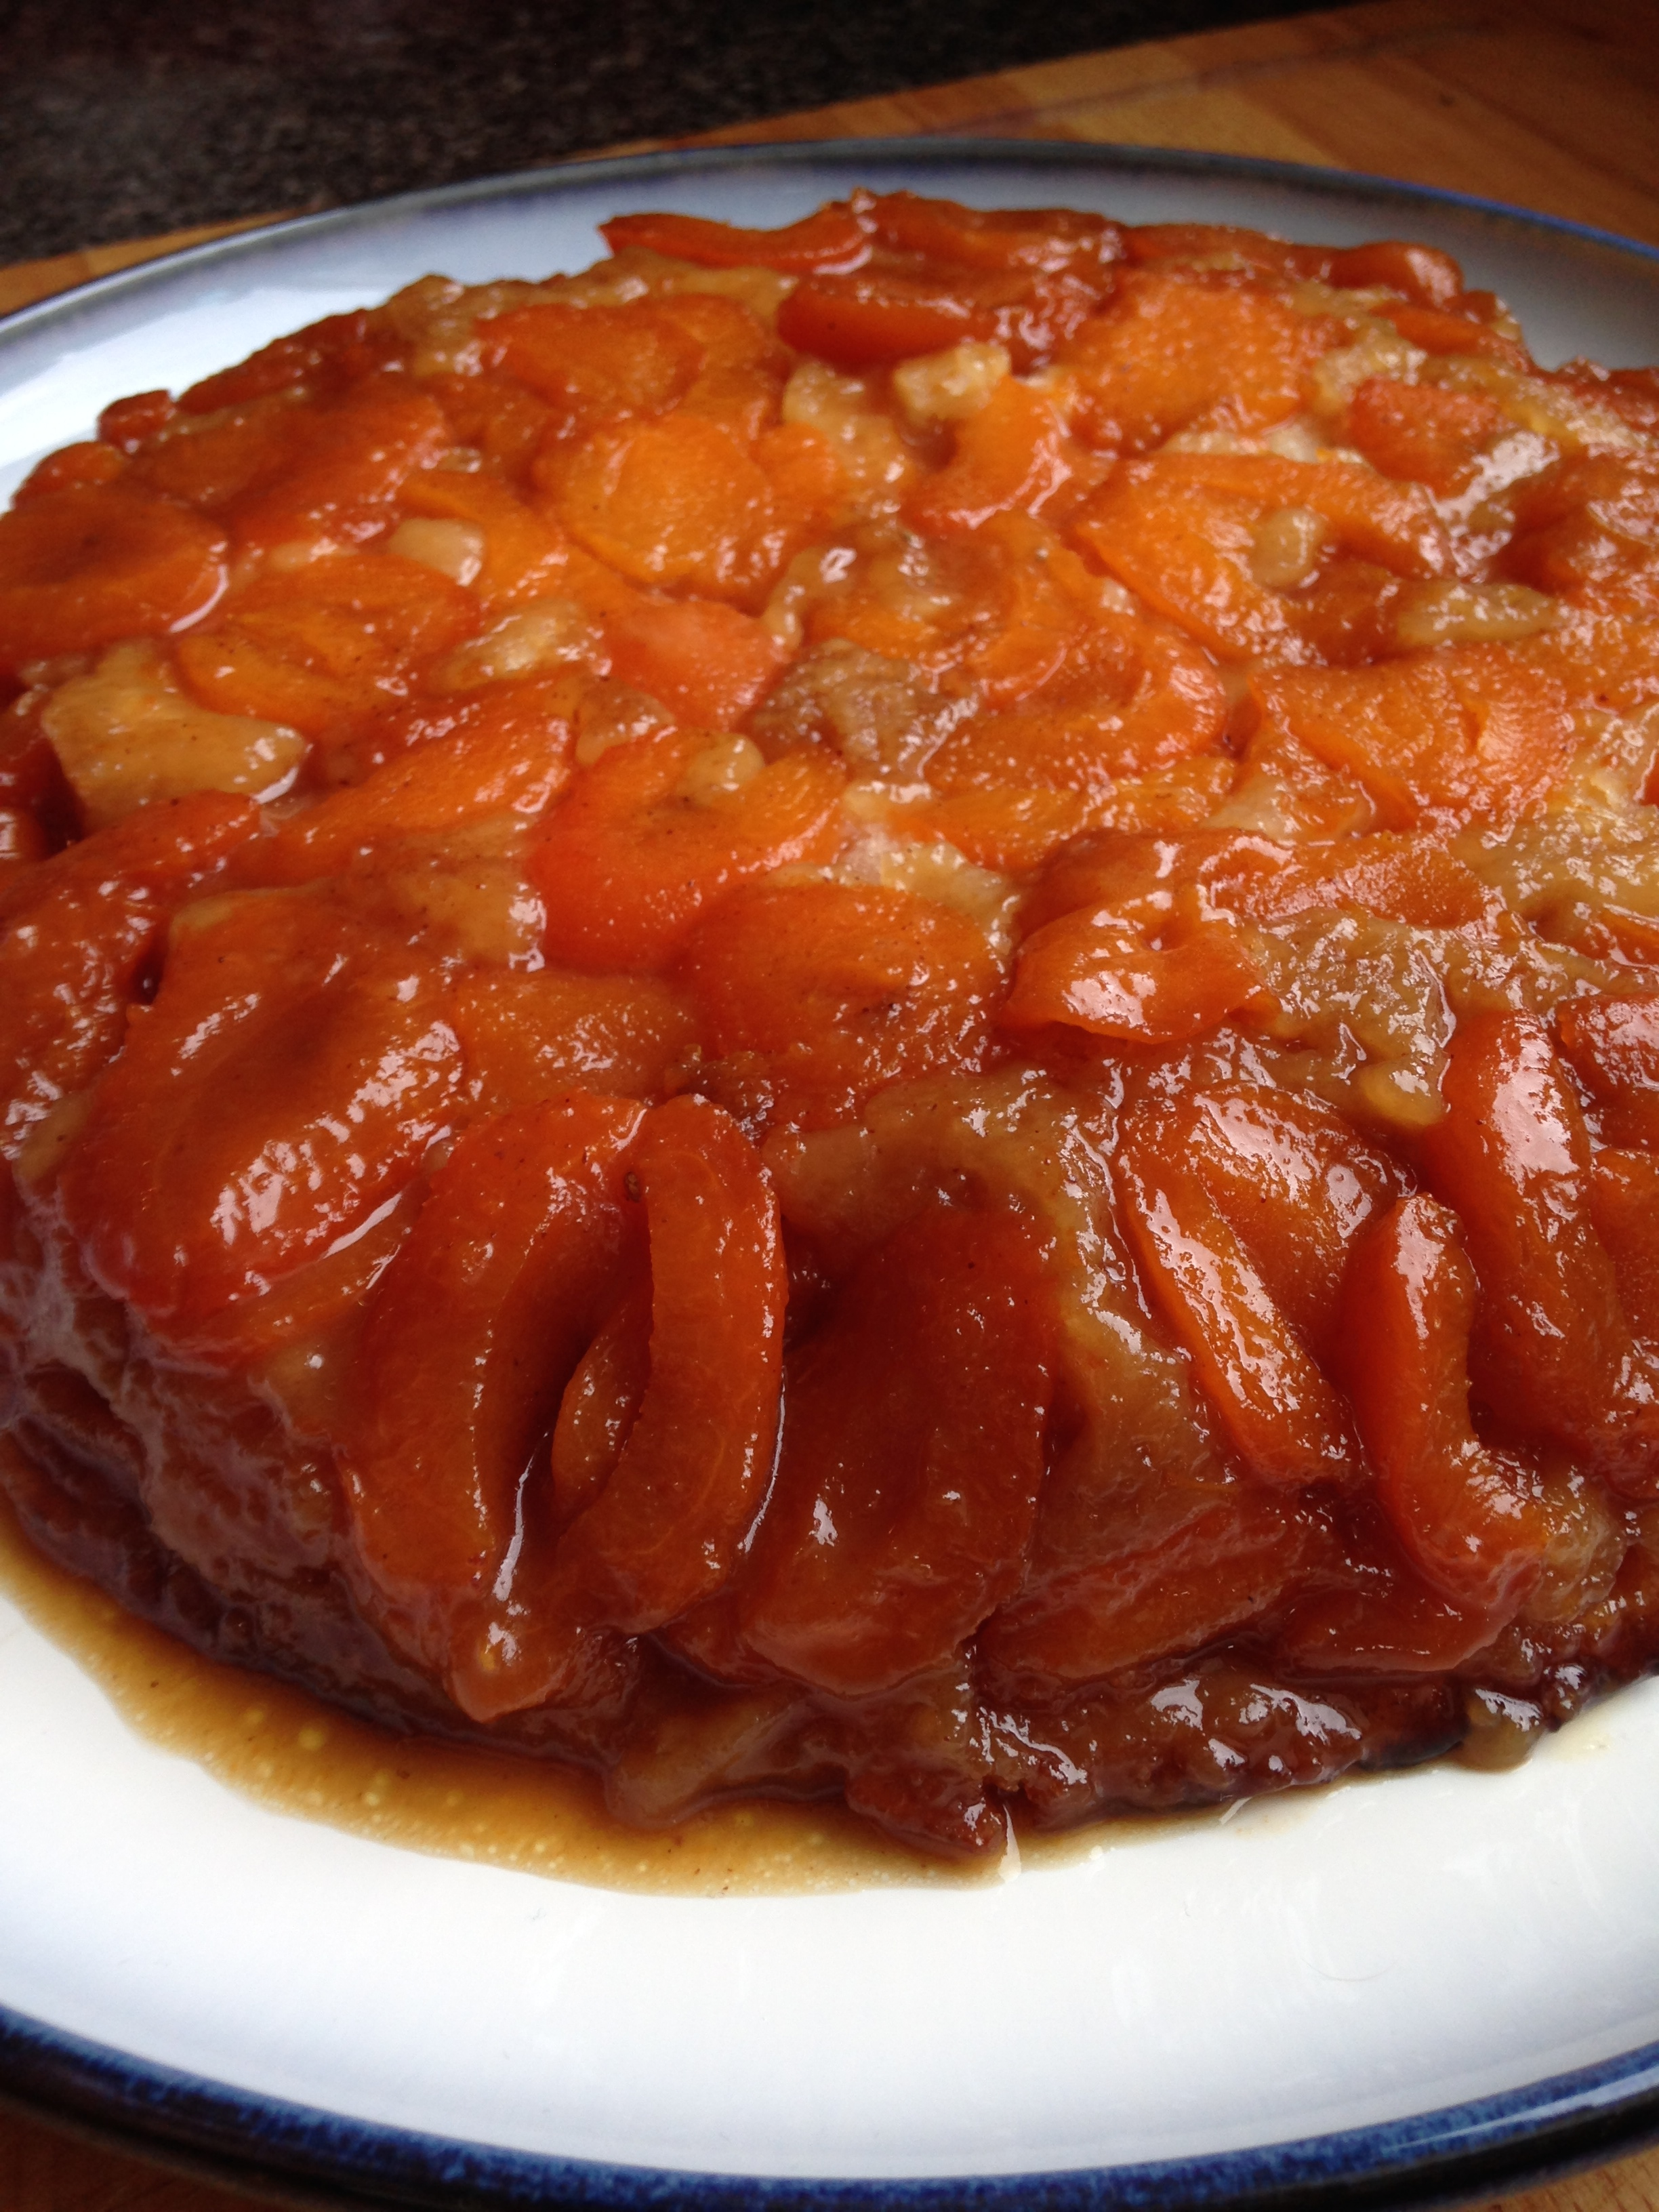 Apricot Upside-down cake!